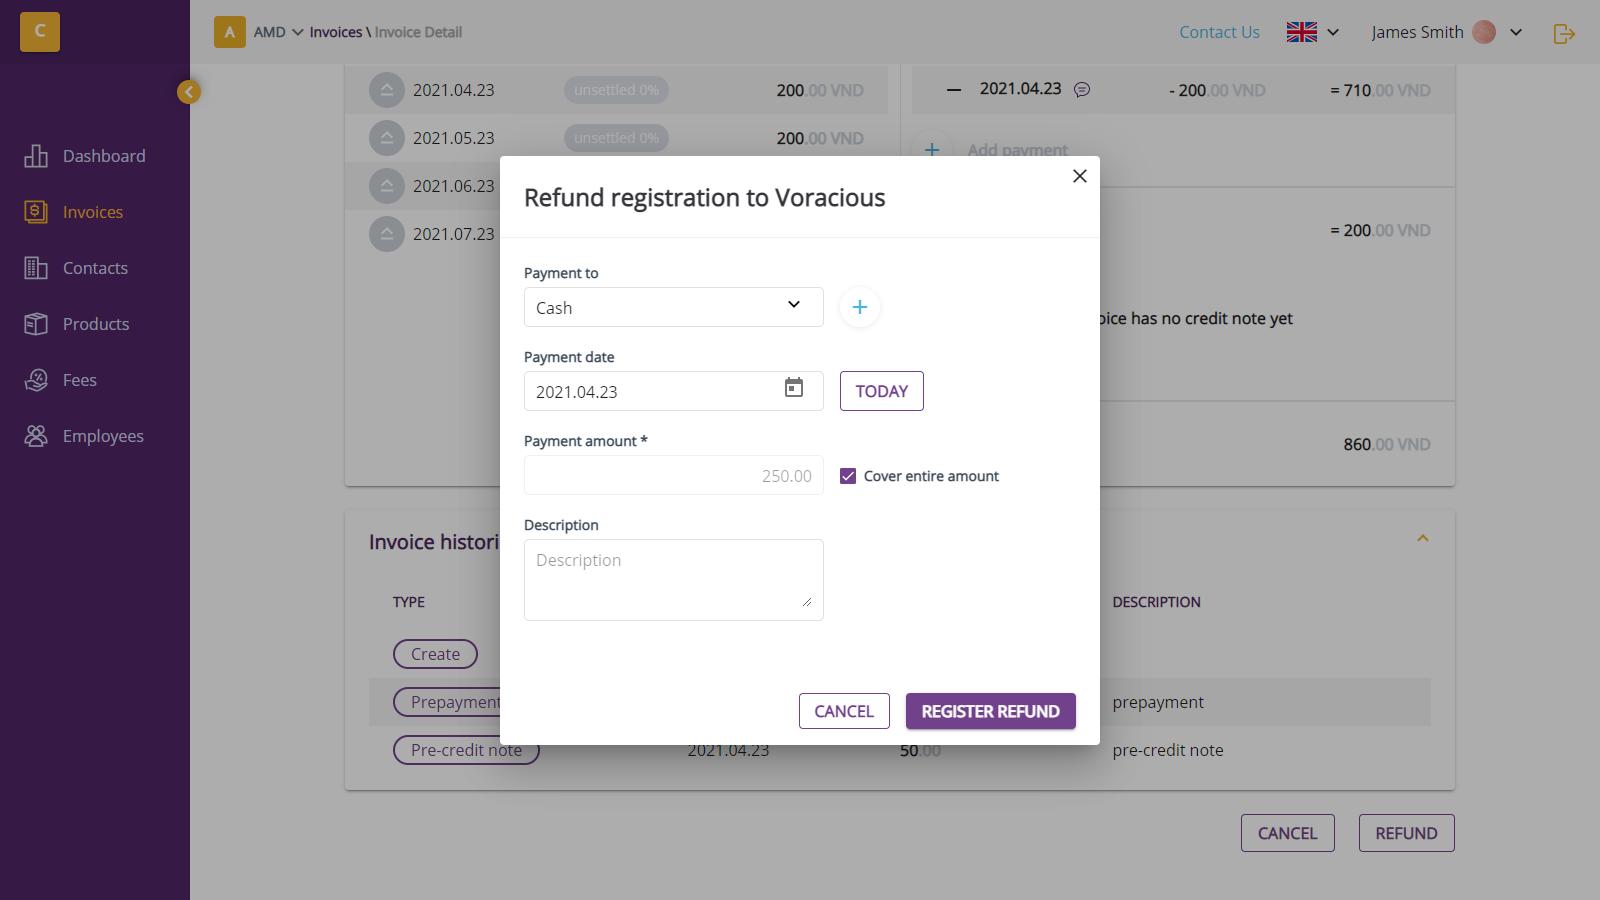 Register refund dialog